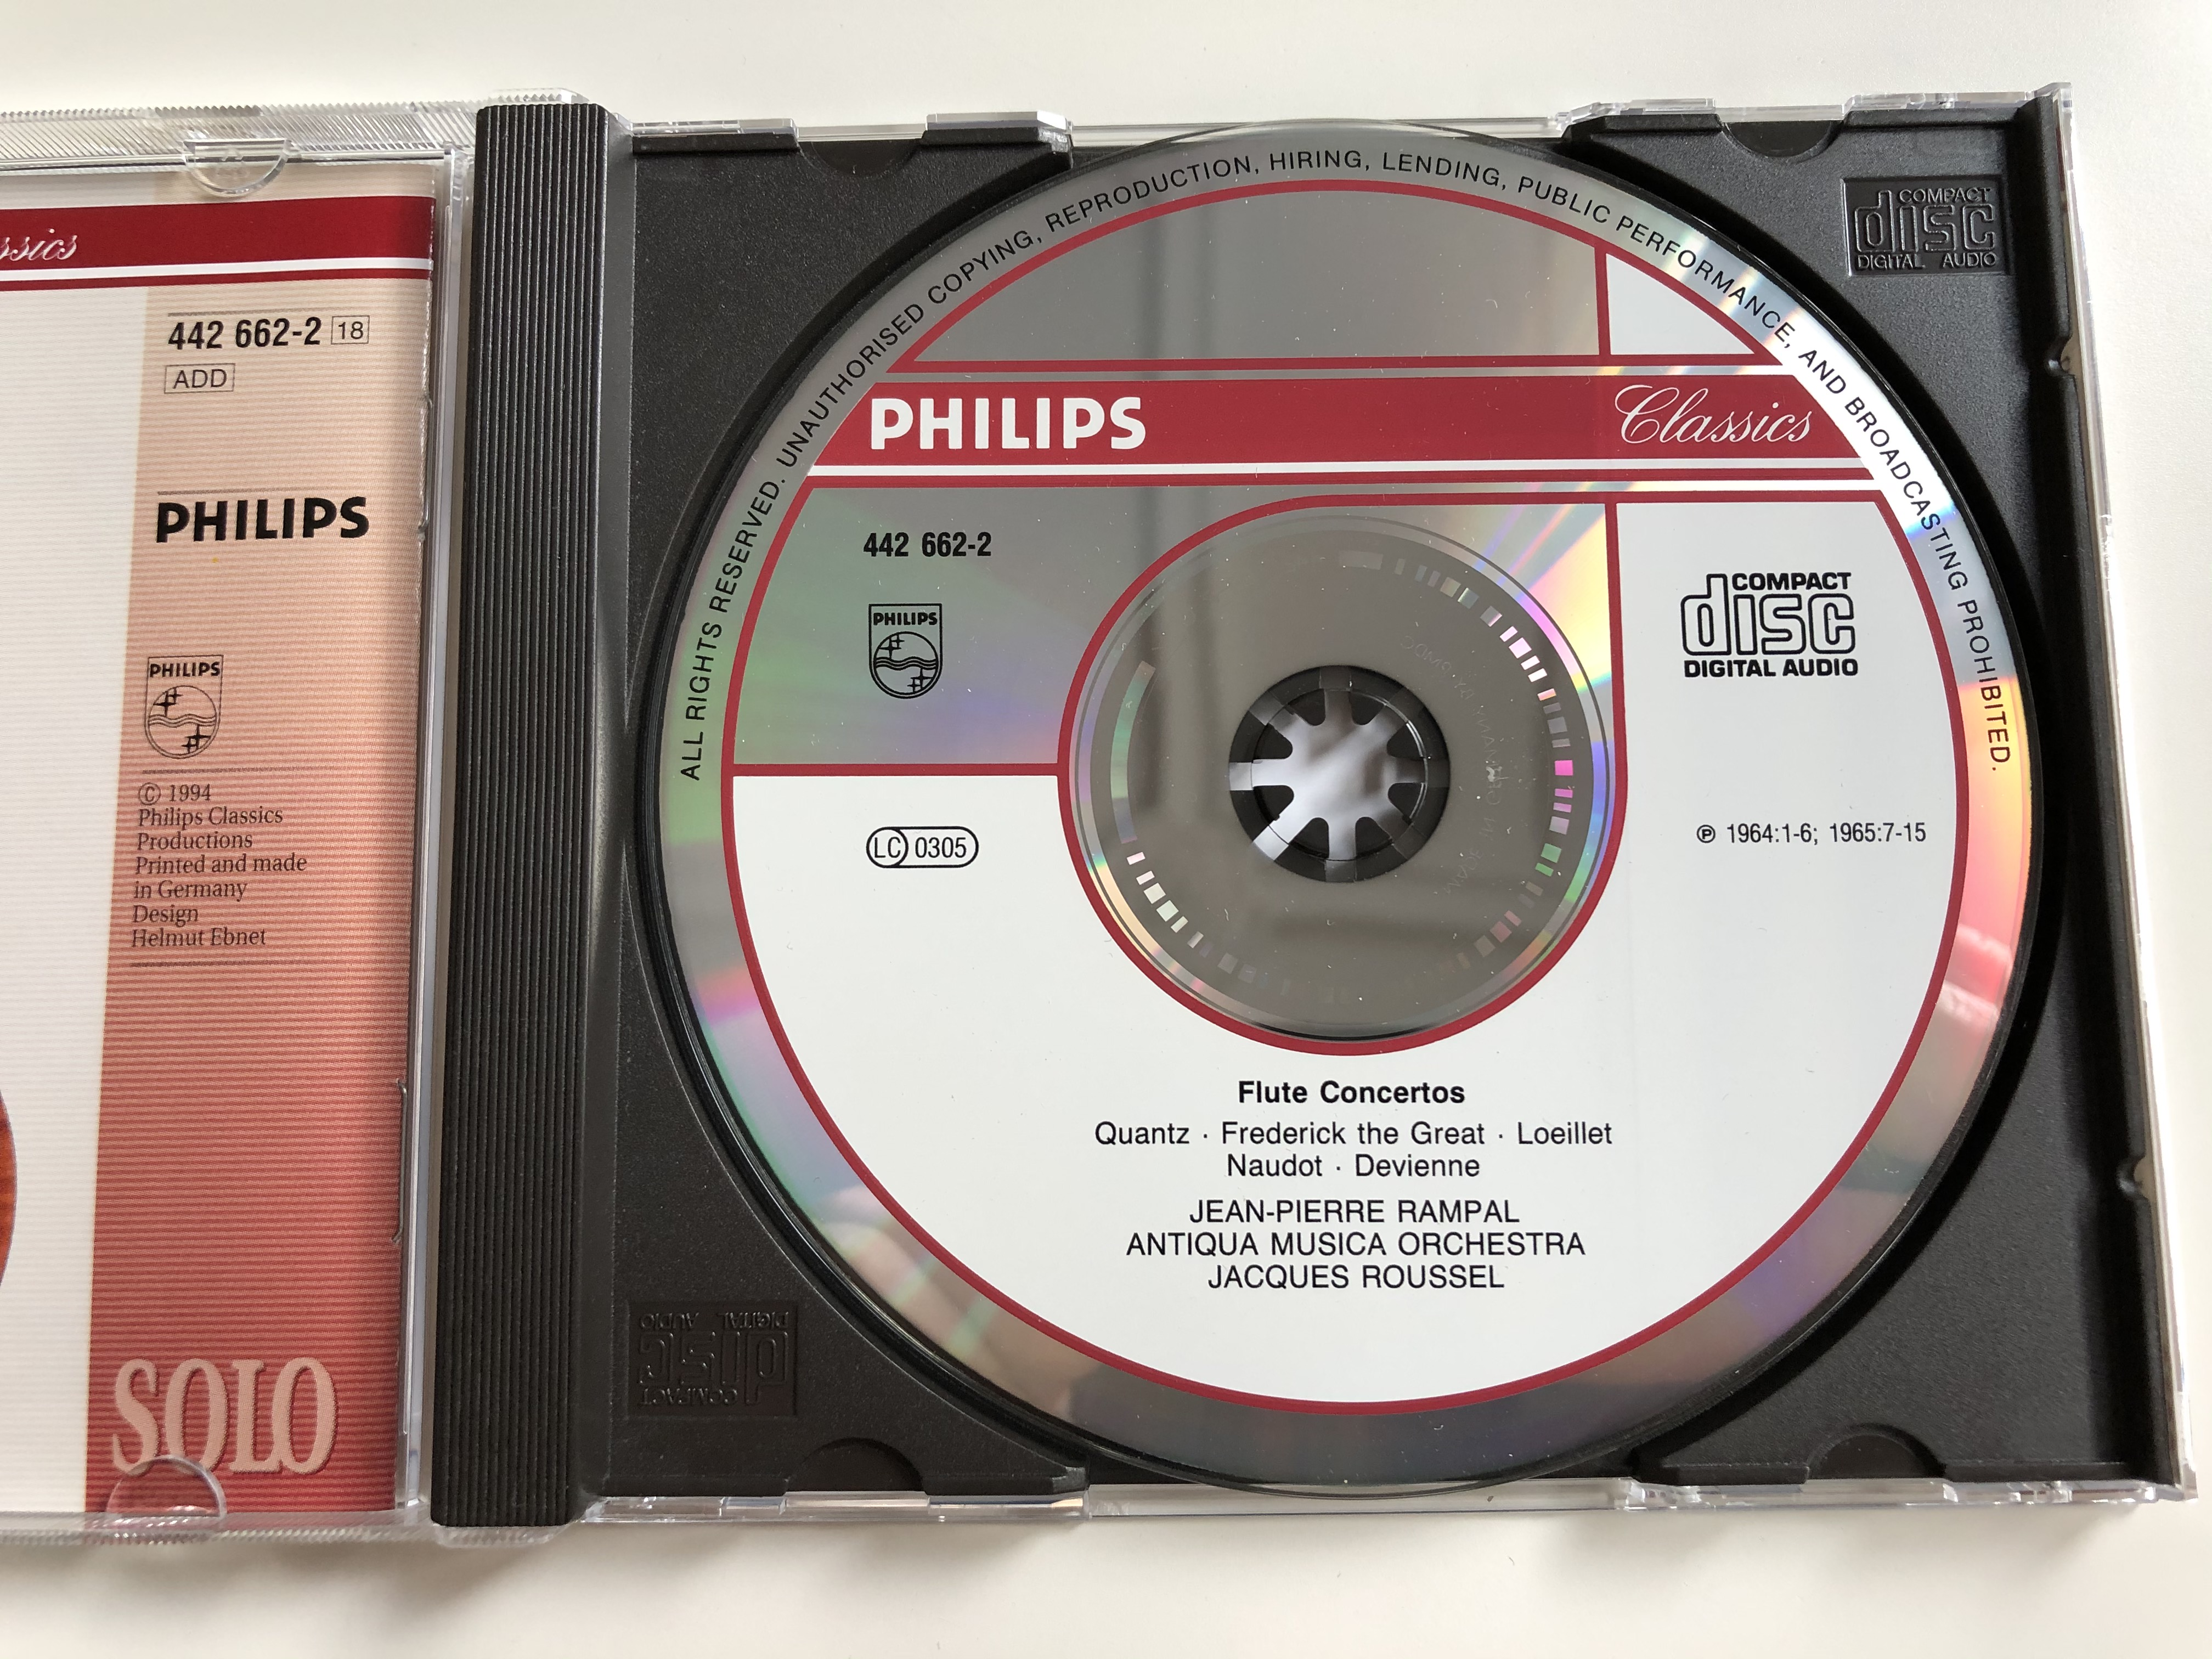 devienne-friedrich-der-grose-loeillet-naudot-quantz-rampal-spielt-flotenkonzerte-des-18.-jahrhunderts-antiqua-musica-orchestra-jacques-roussel-solo-65-min-philips-audio-cd-1994-442-6-6-.jpg